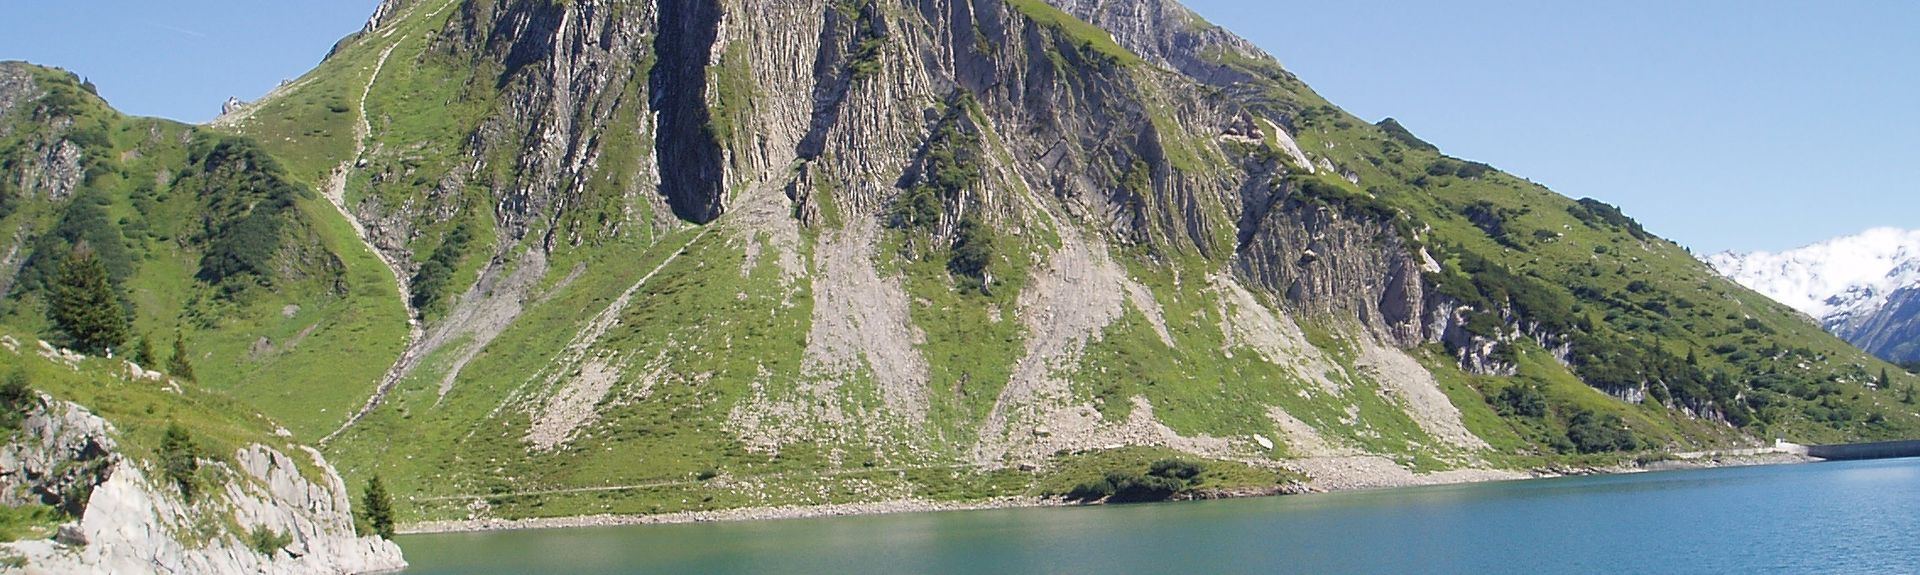 Domaine skiable de Diedamskopf, Schoppernau, Vorarlberg, Autriche